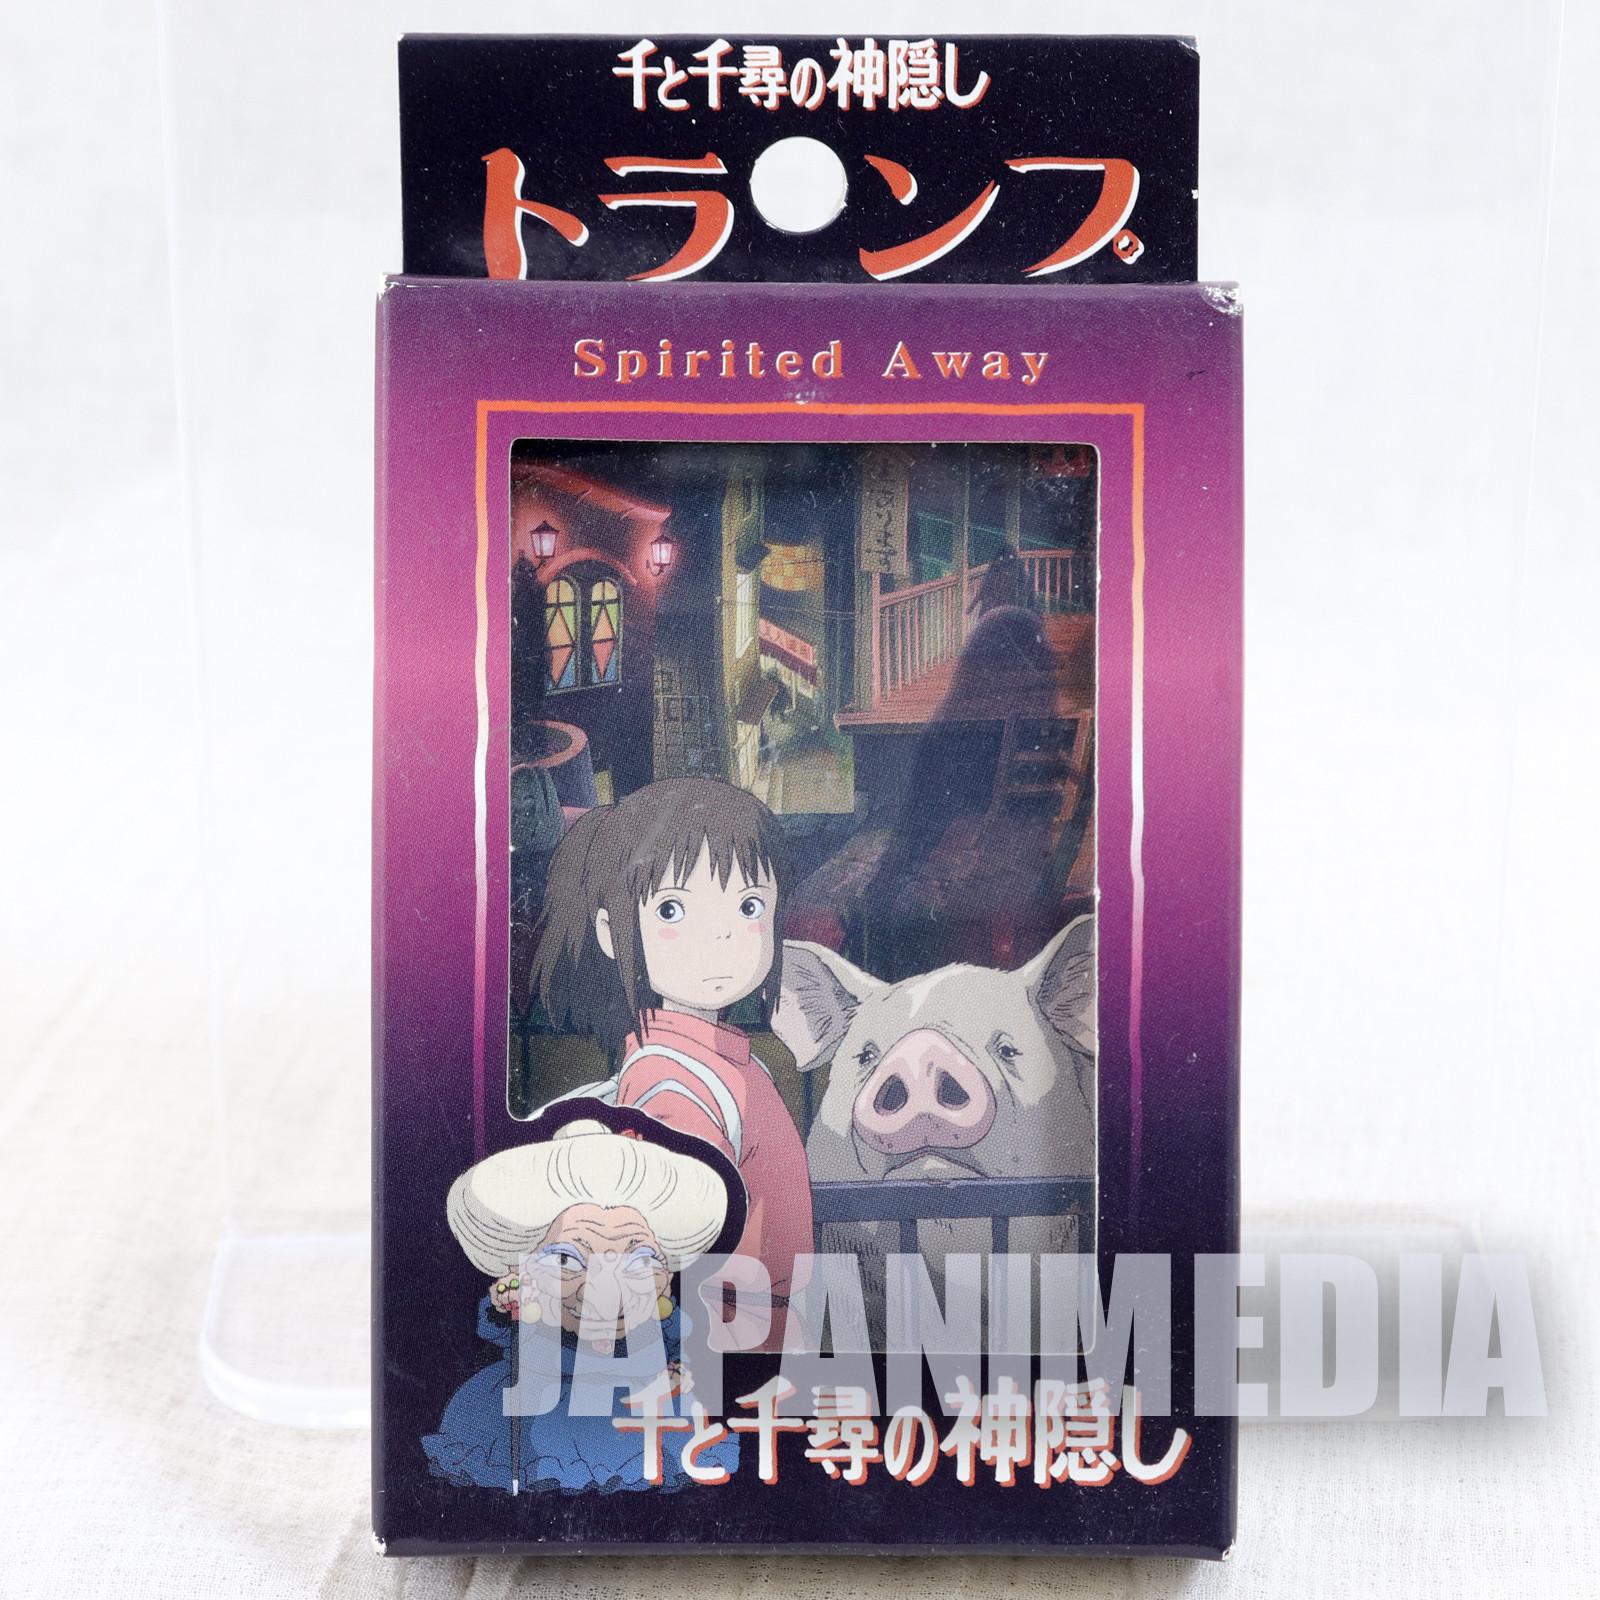 Spirited Away Trump Playing Cards Studio Ghibli JAPAN ANIME MANGA